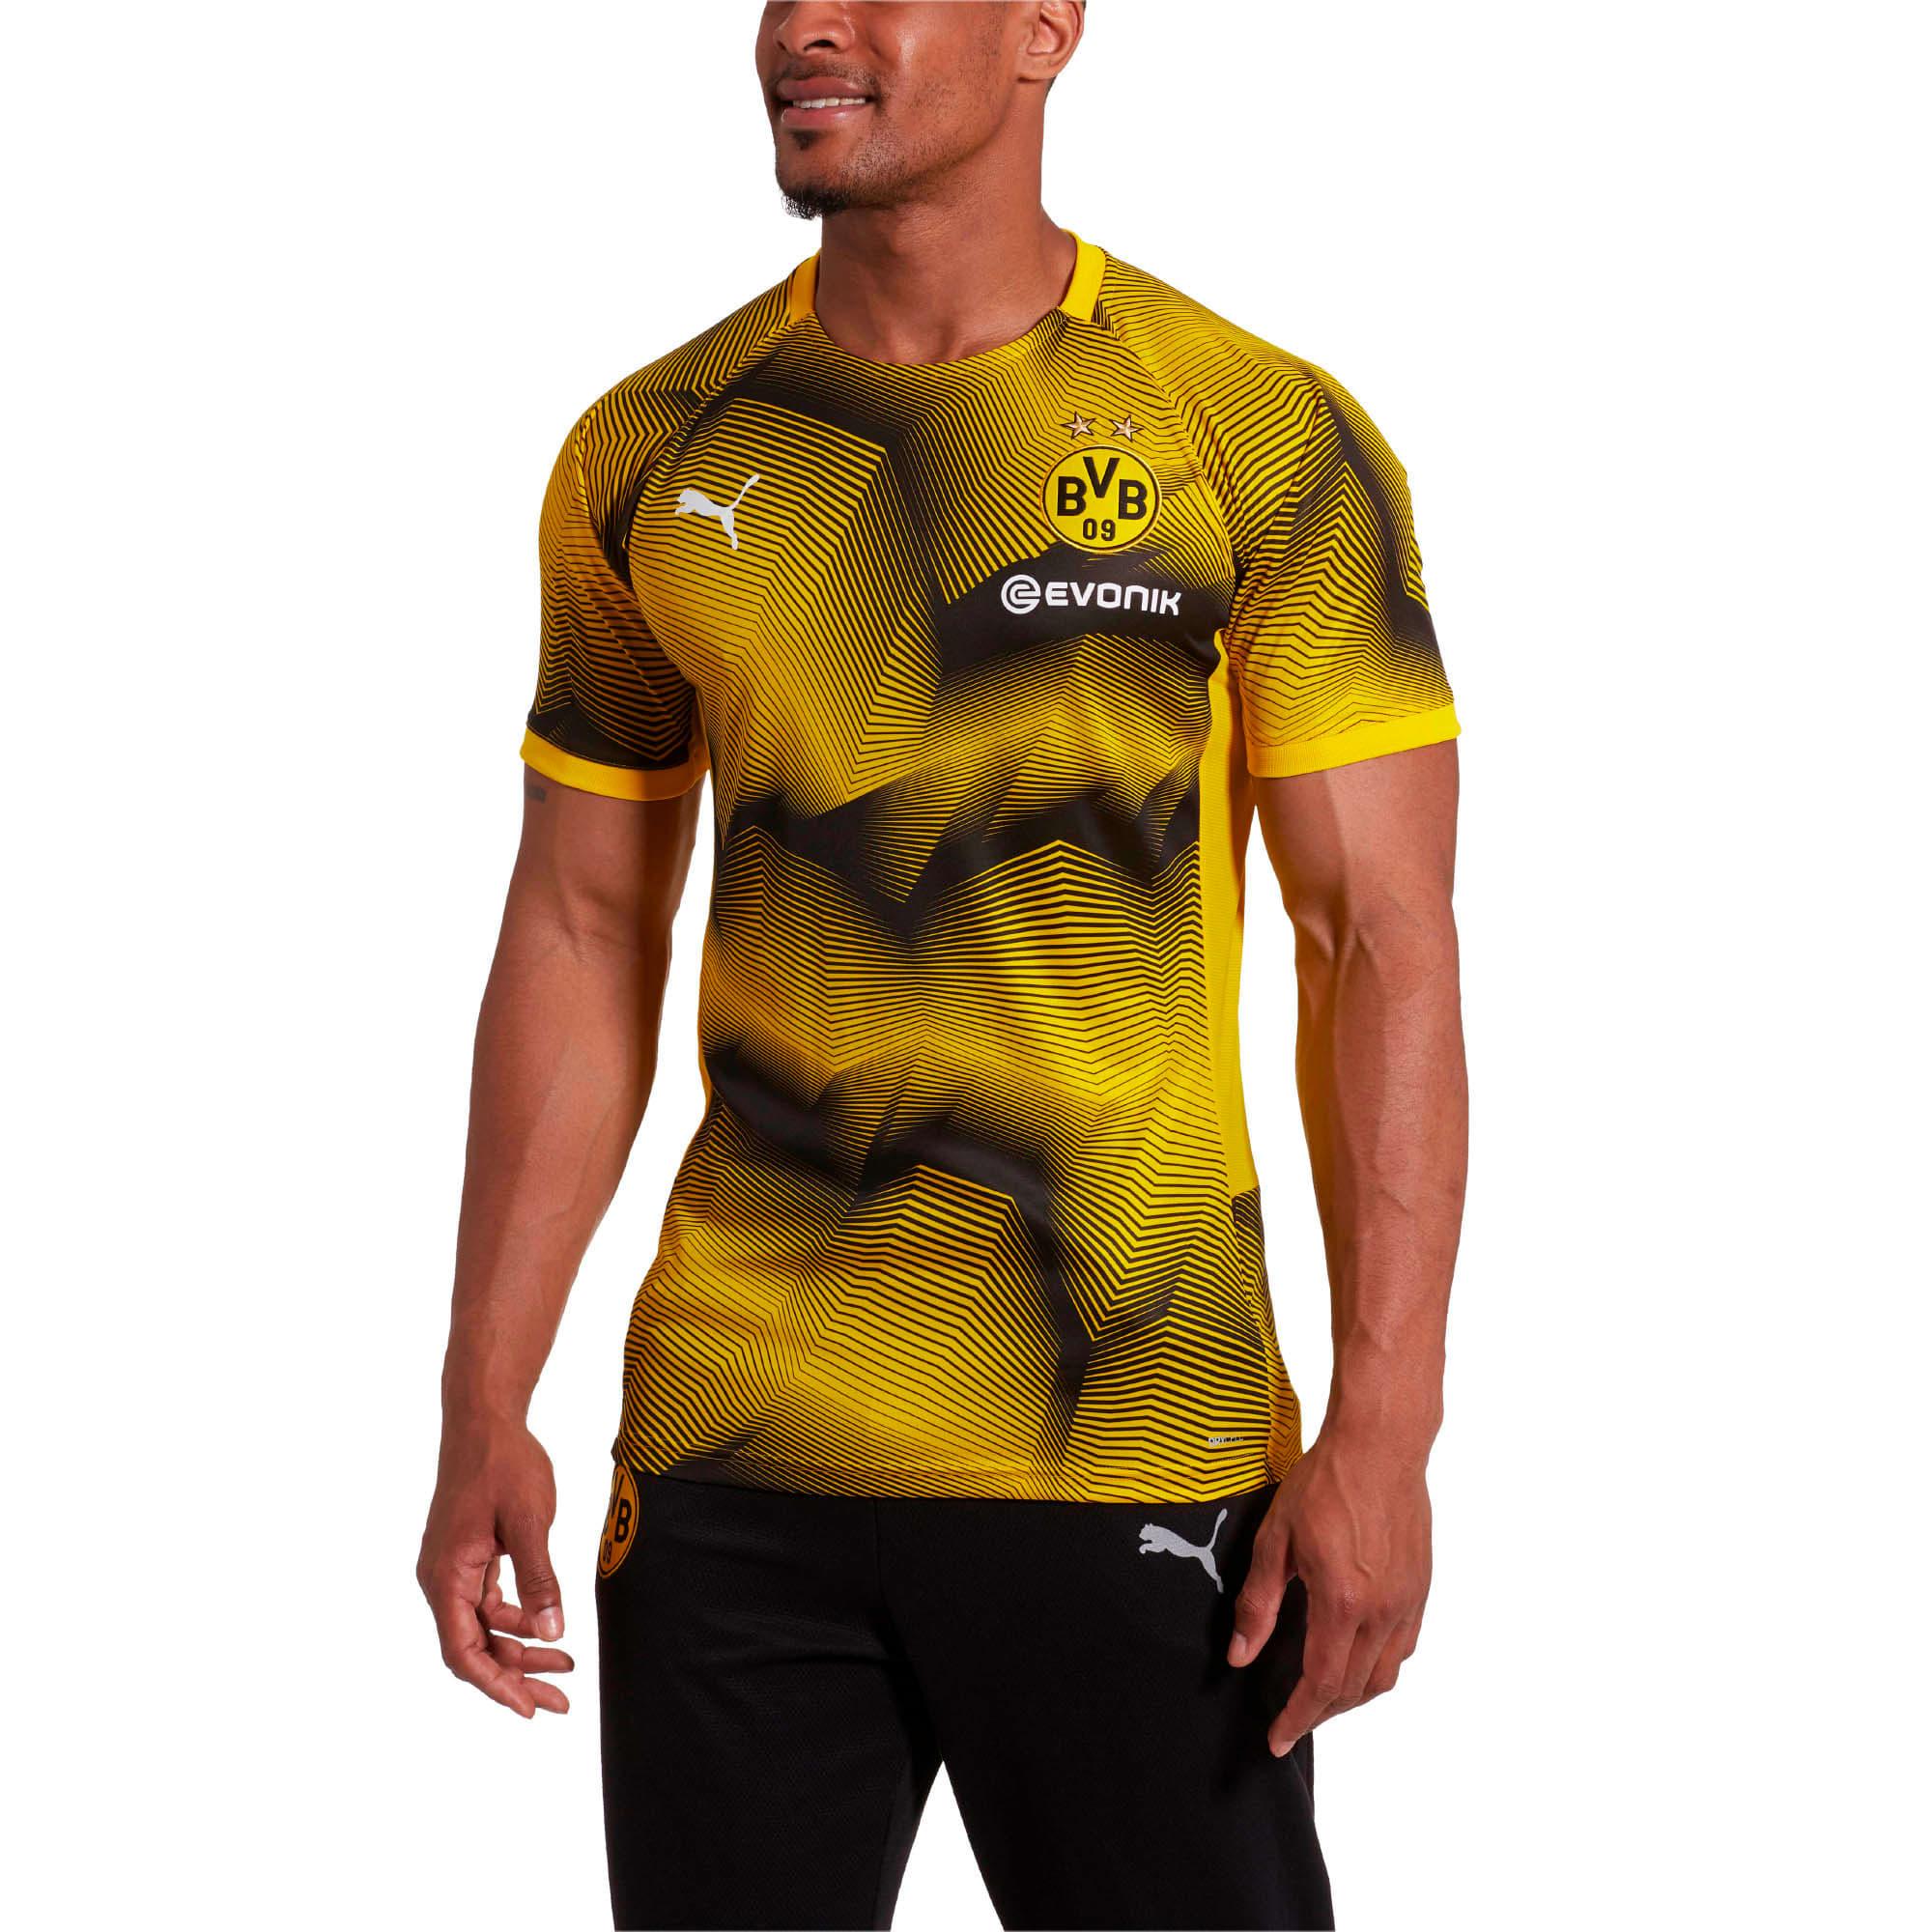 Thumbnail 2 of BVB Stadium Graphic Jersey, cyber yellow-Cyber Yellow, medium